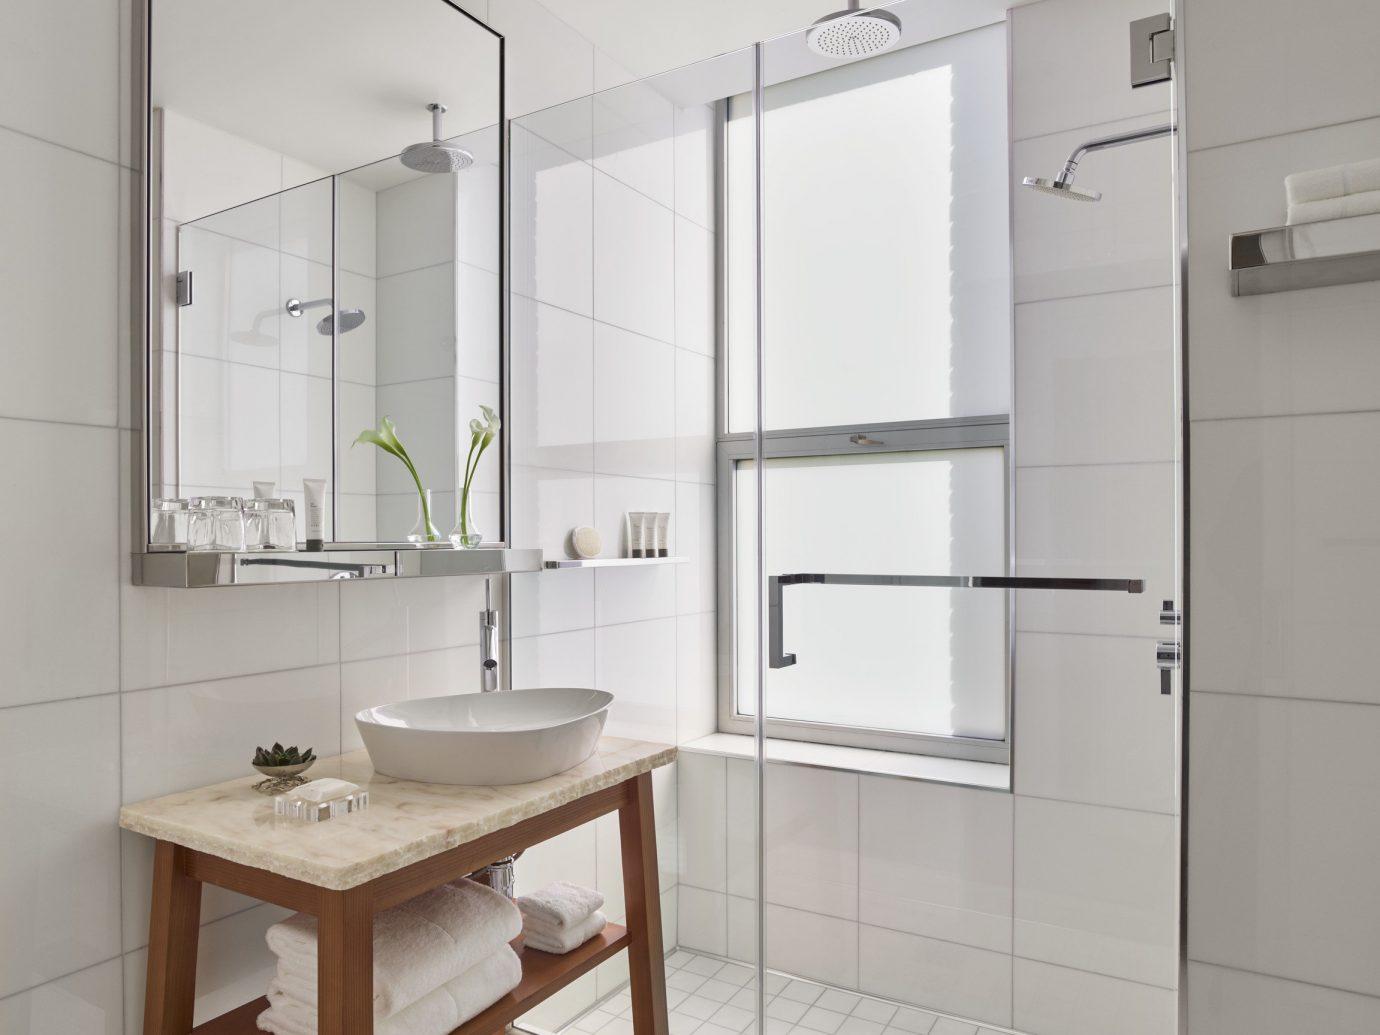 NYC Trip Ideas indoor bathroom room bathroom accessory sink bathroom cabinet product design interior design plumbing fixture floor angle tap interior designer